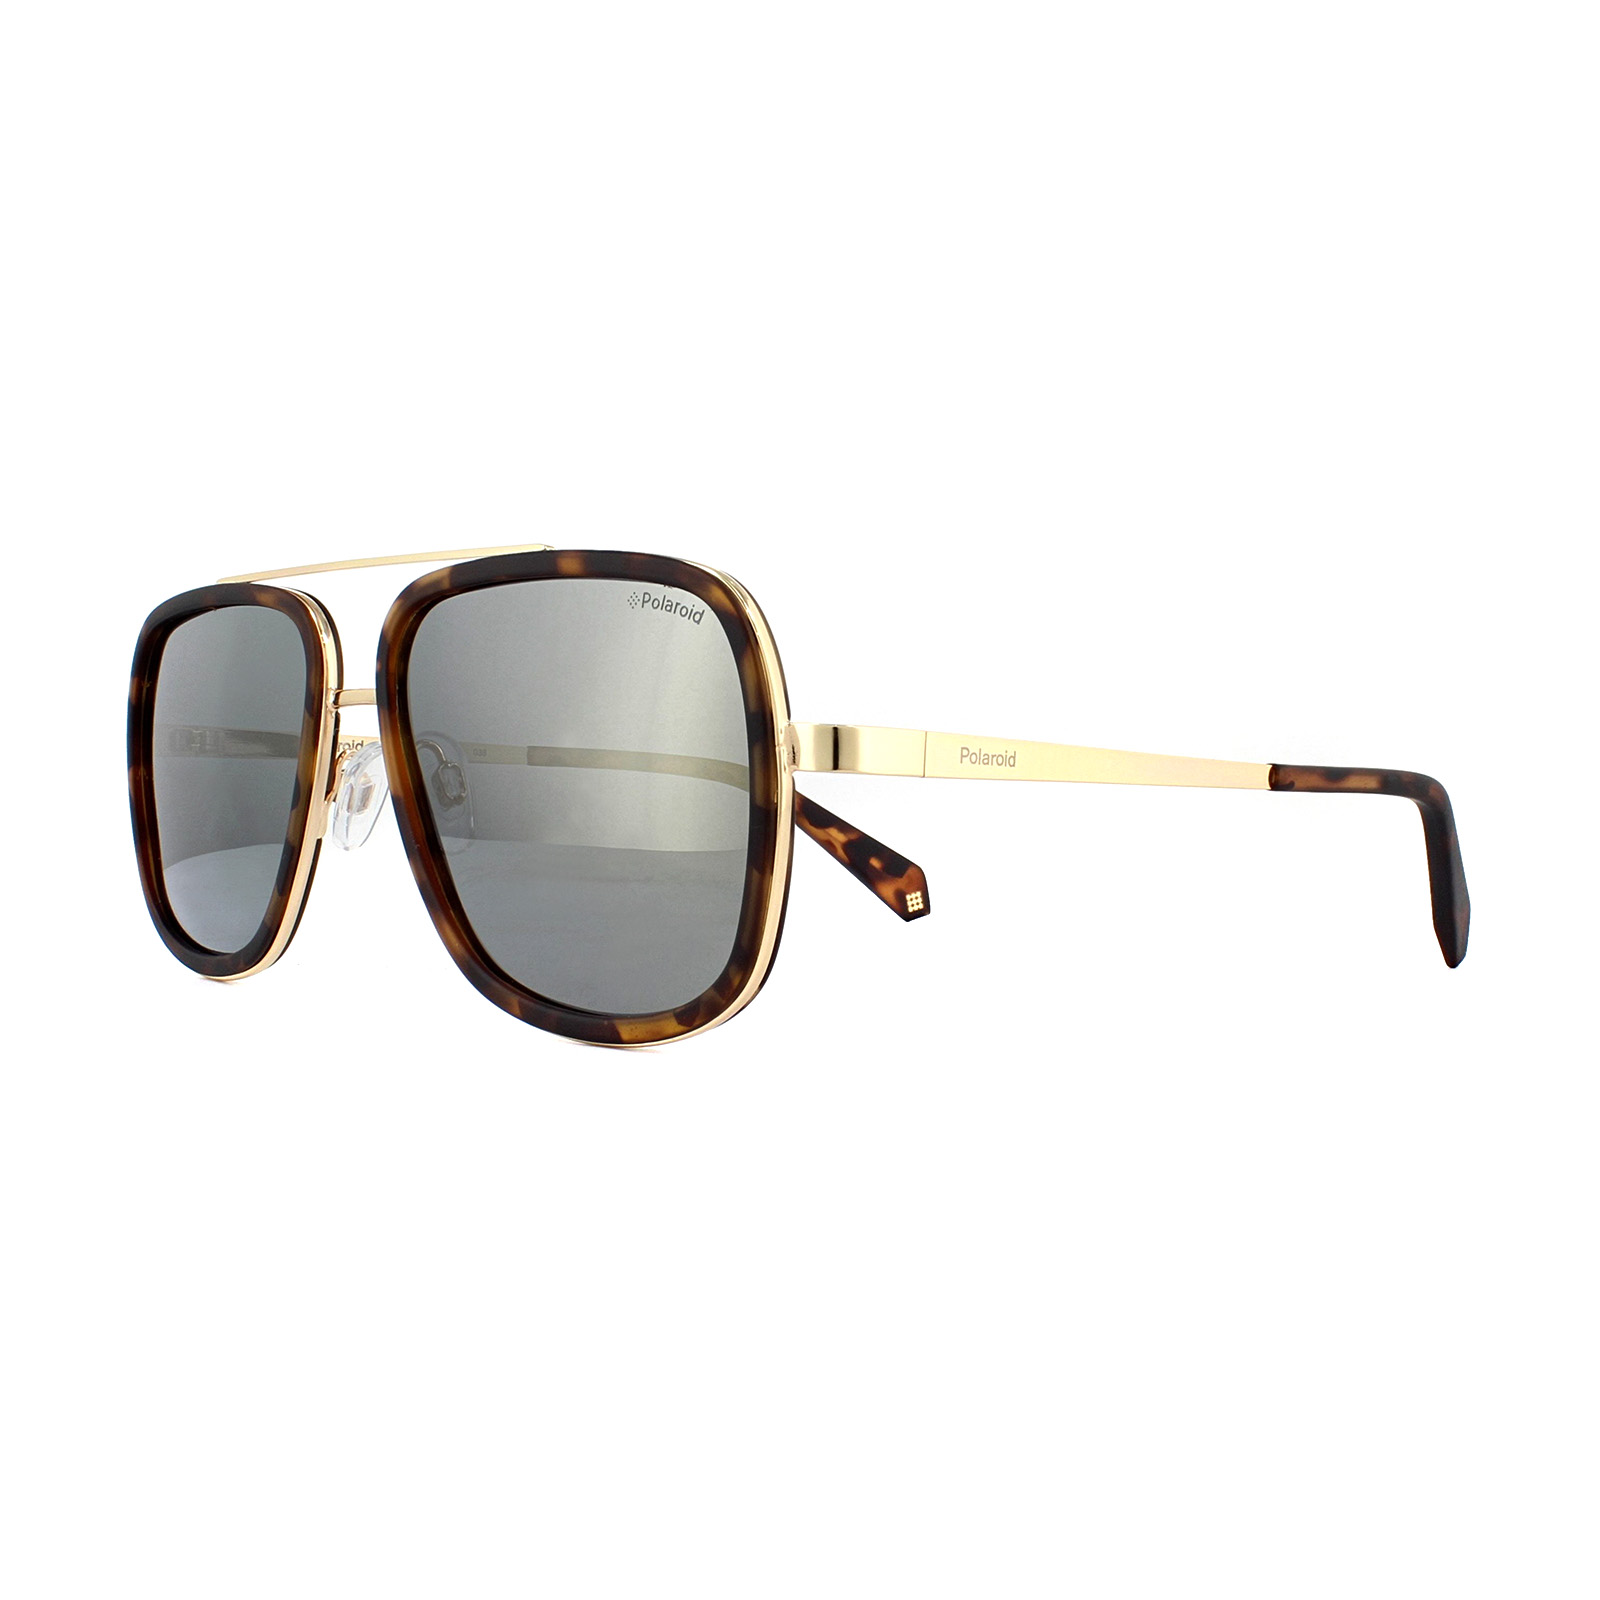 bdb59002a1c Sentinel Polaroid Sunglasses PLD 6033 S 086 LM Dark Havana Grey Gold Mirror  Polarized